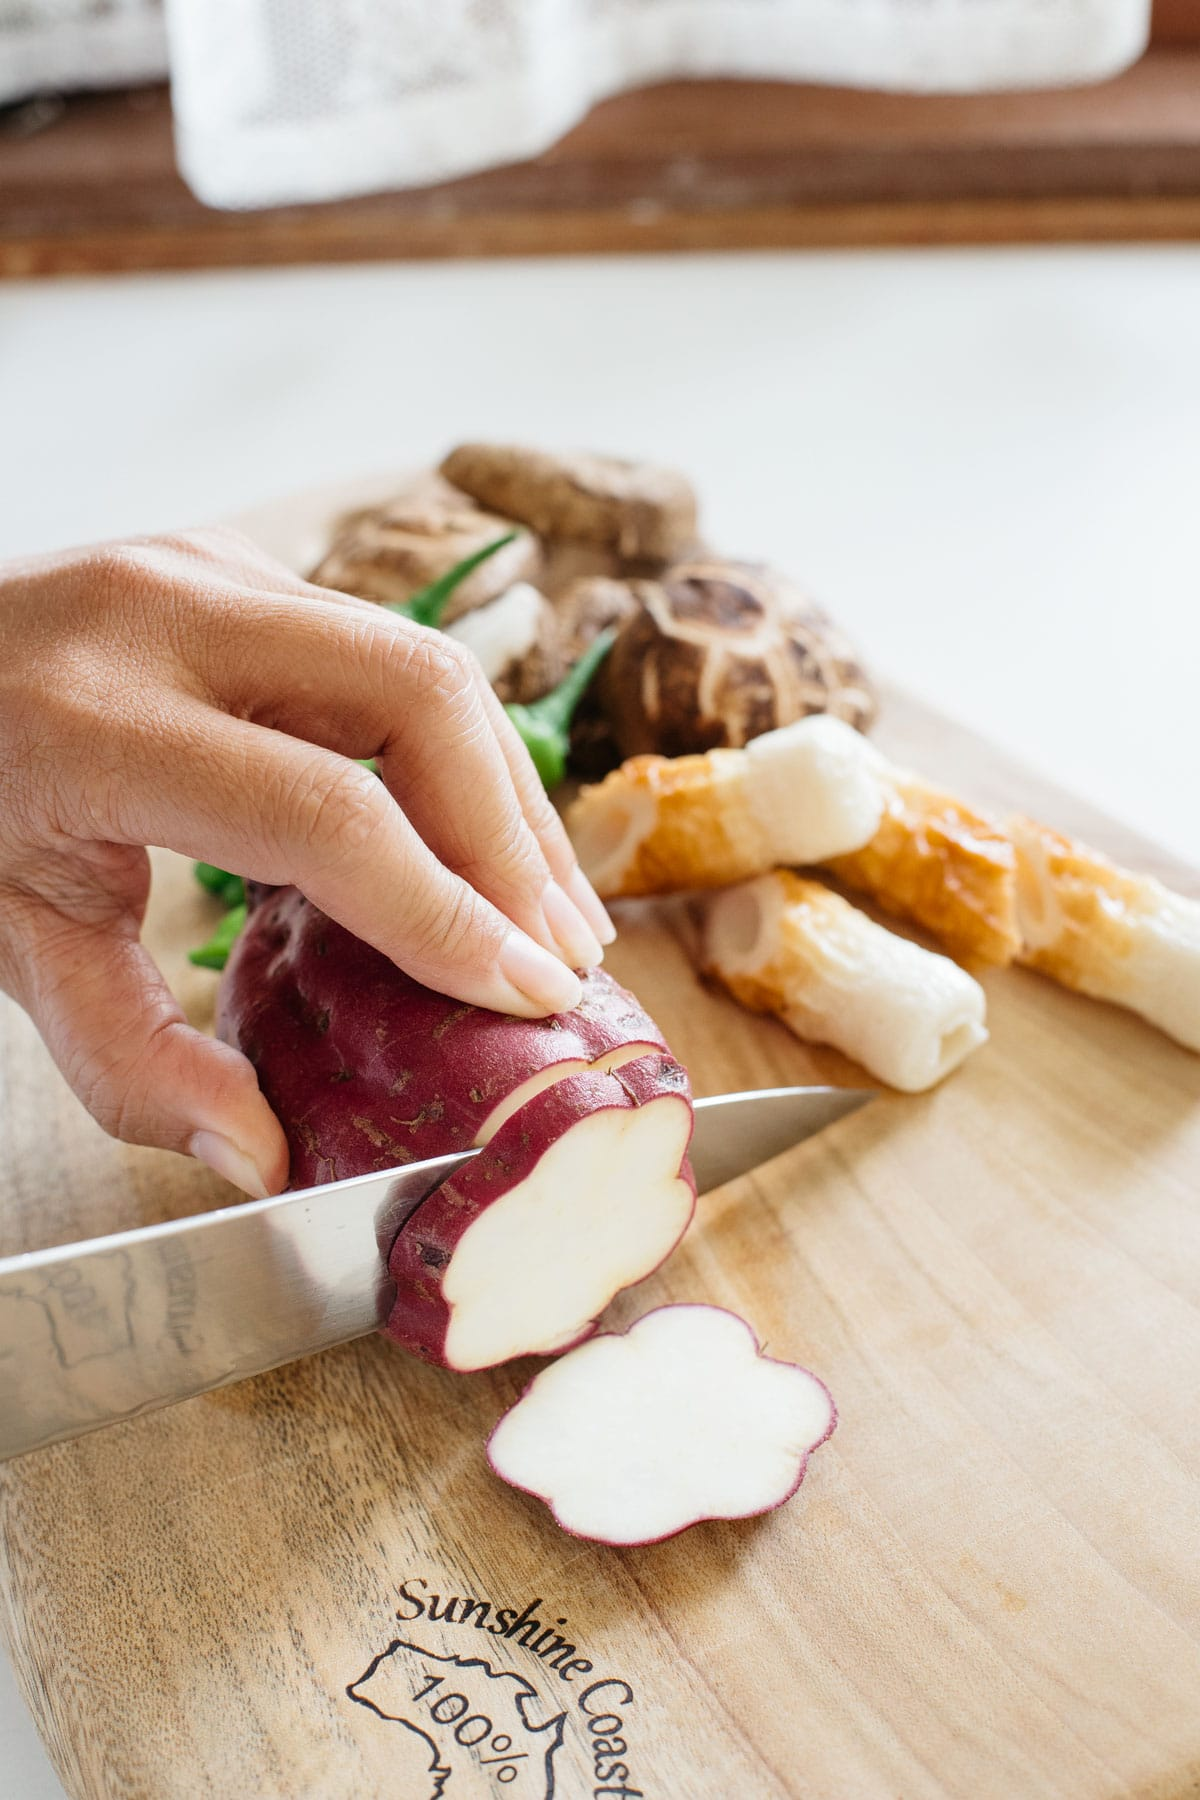 Purple sweet potato being sliced on a chopping board